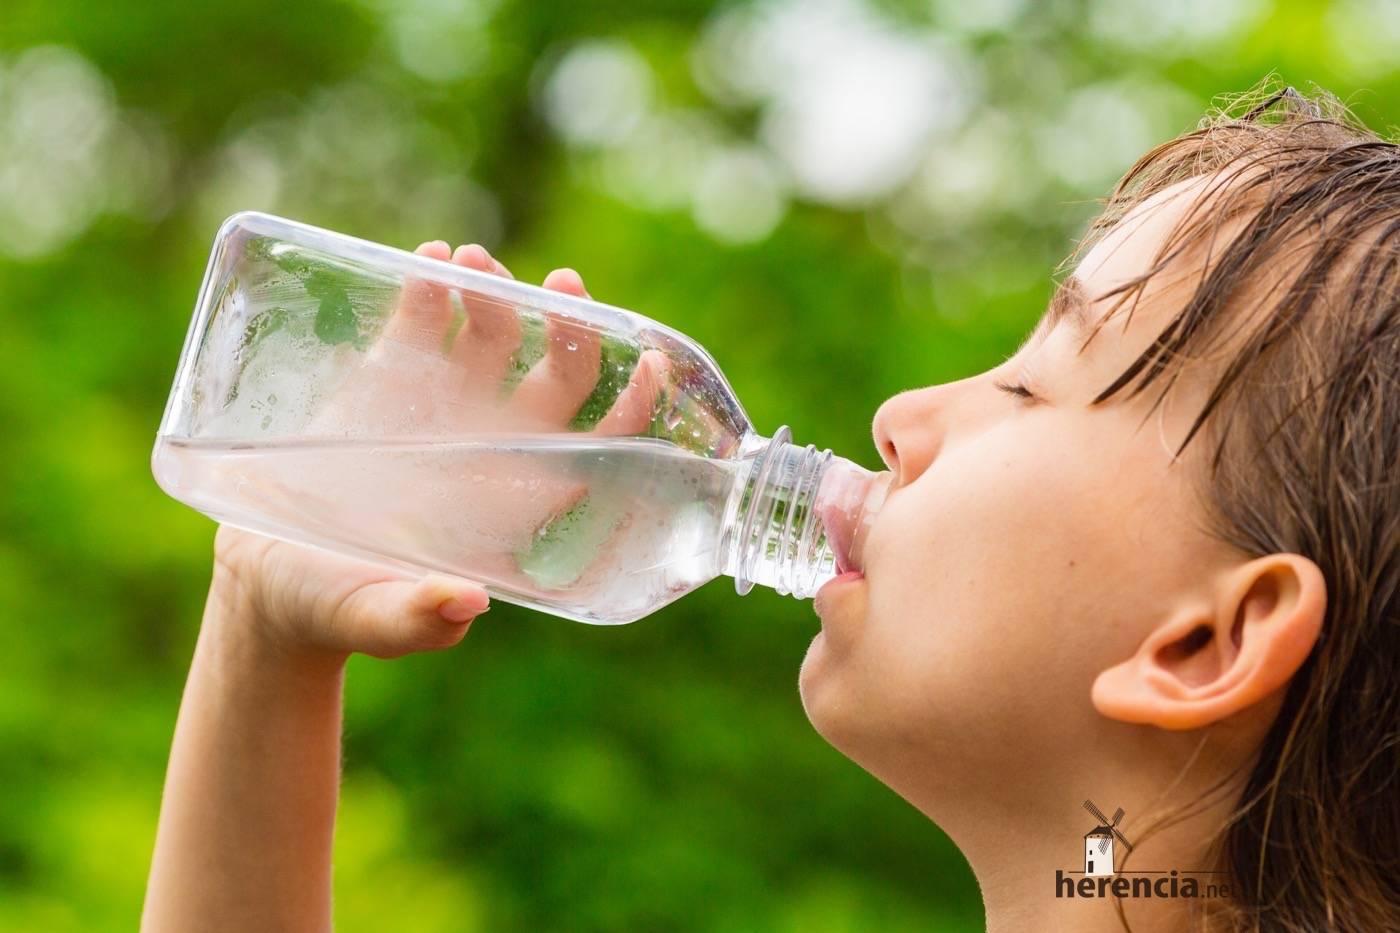 beber mucha agua con altas temperaturas